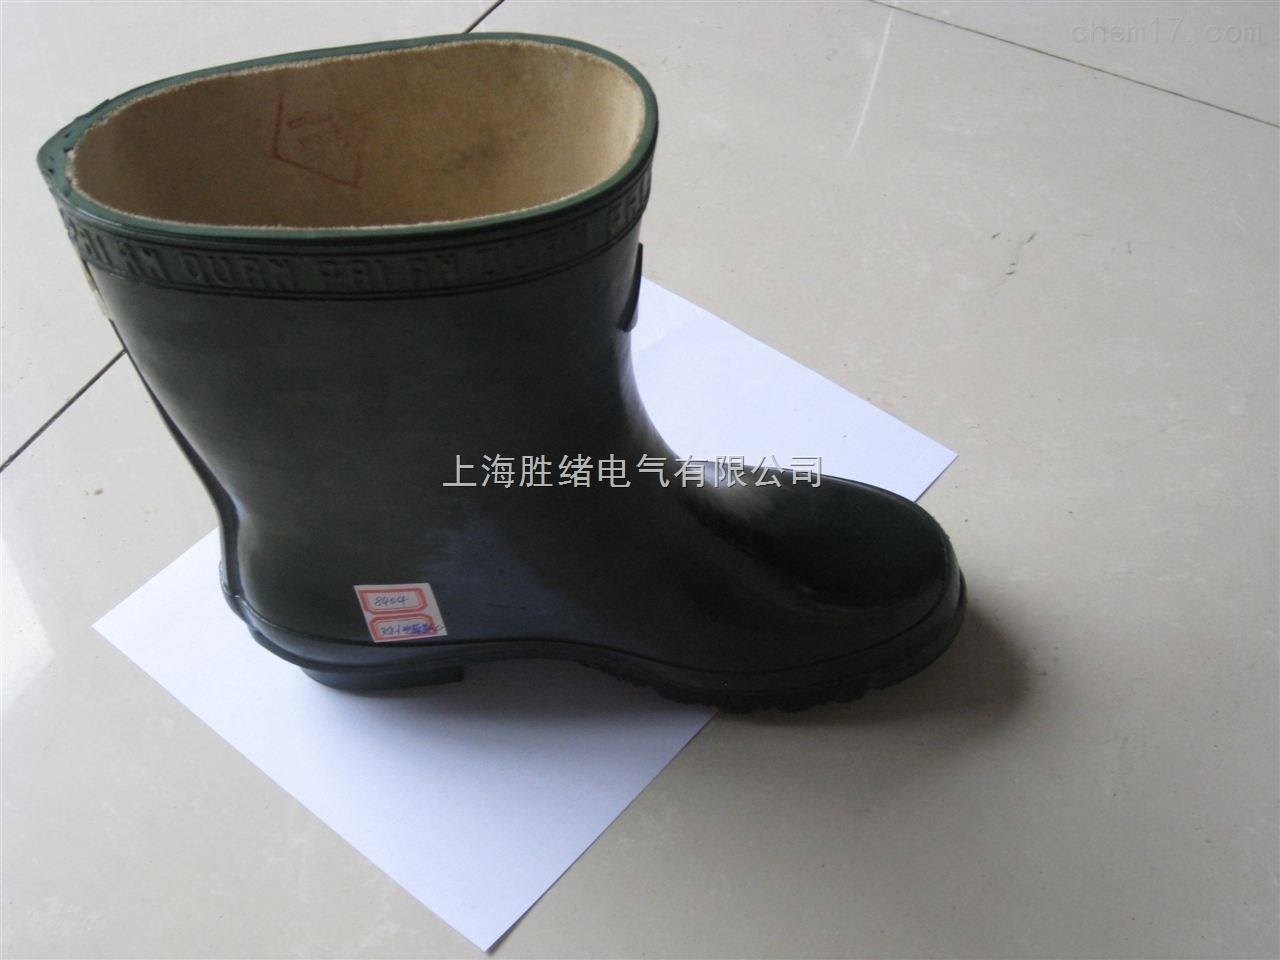 35kv高压绝缘靴厂家|价格